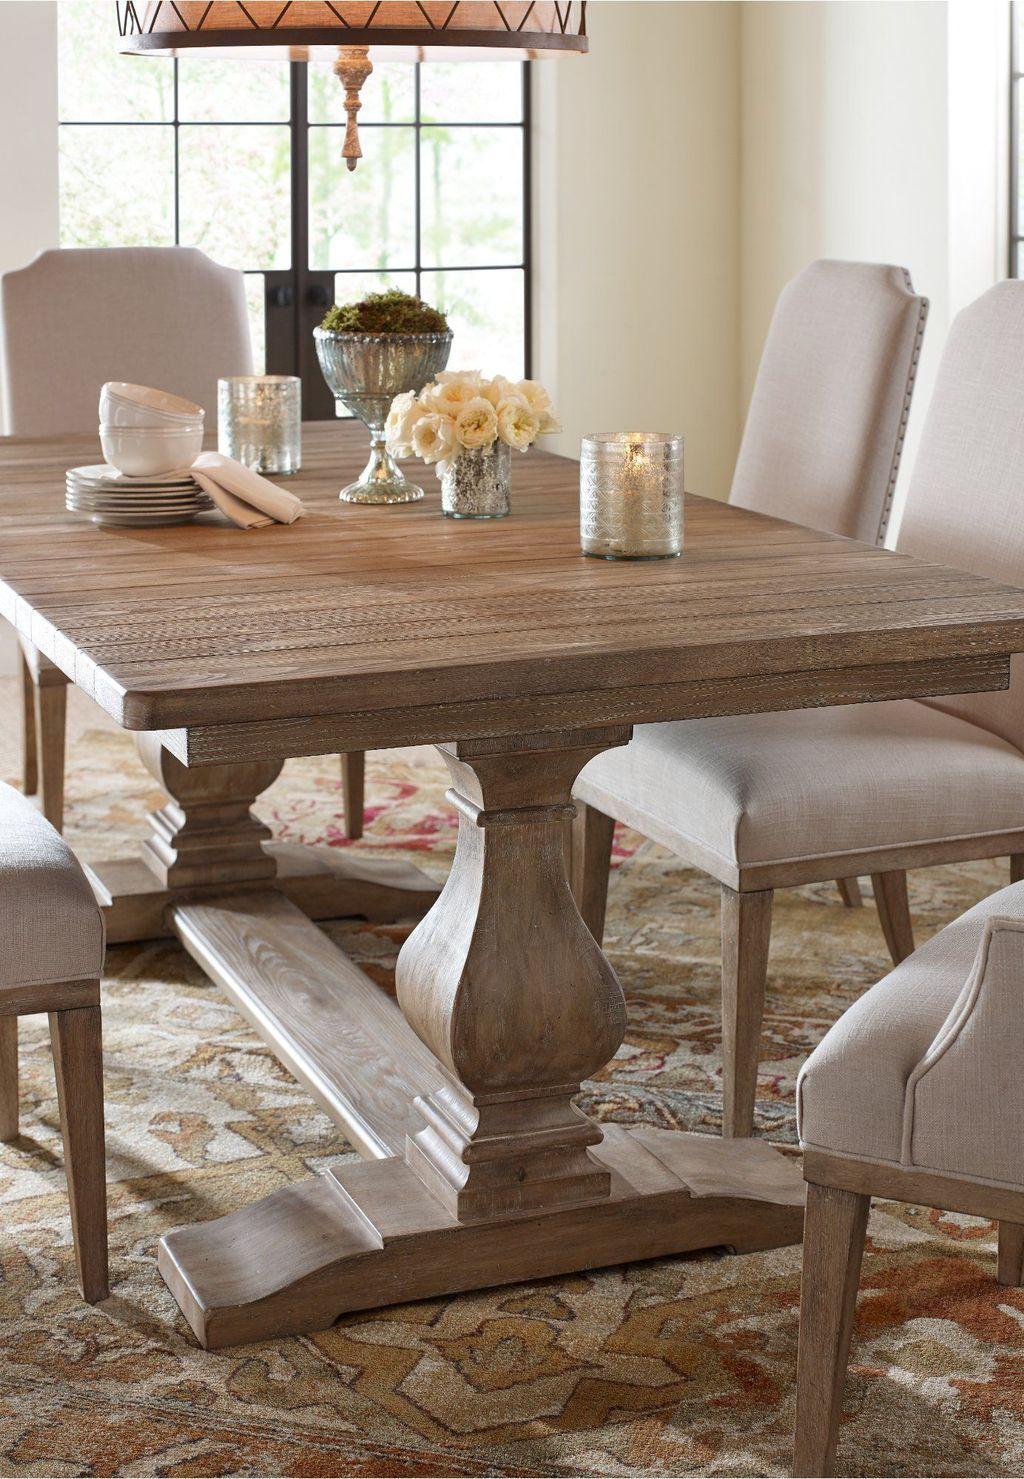 37 Fascinating Farmhouse Dining Table Design Ideas